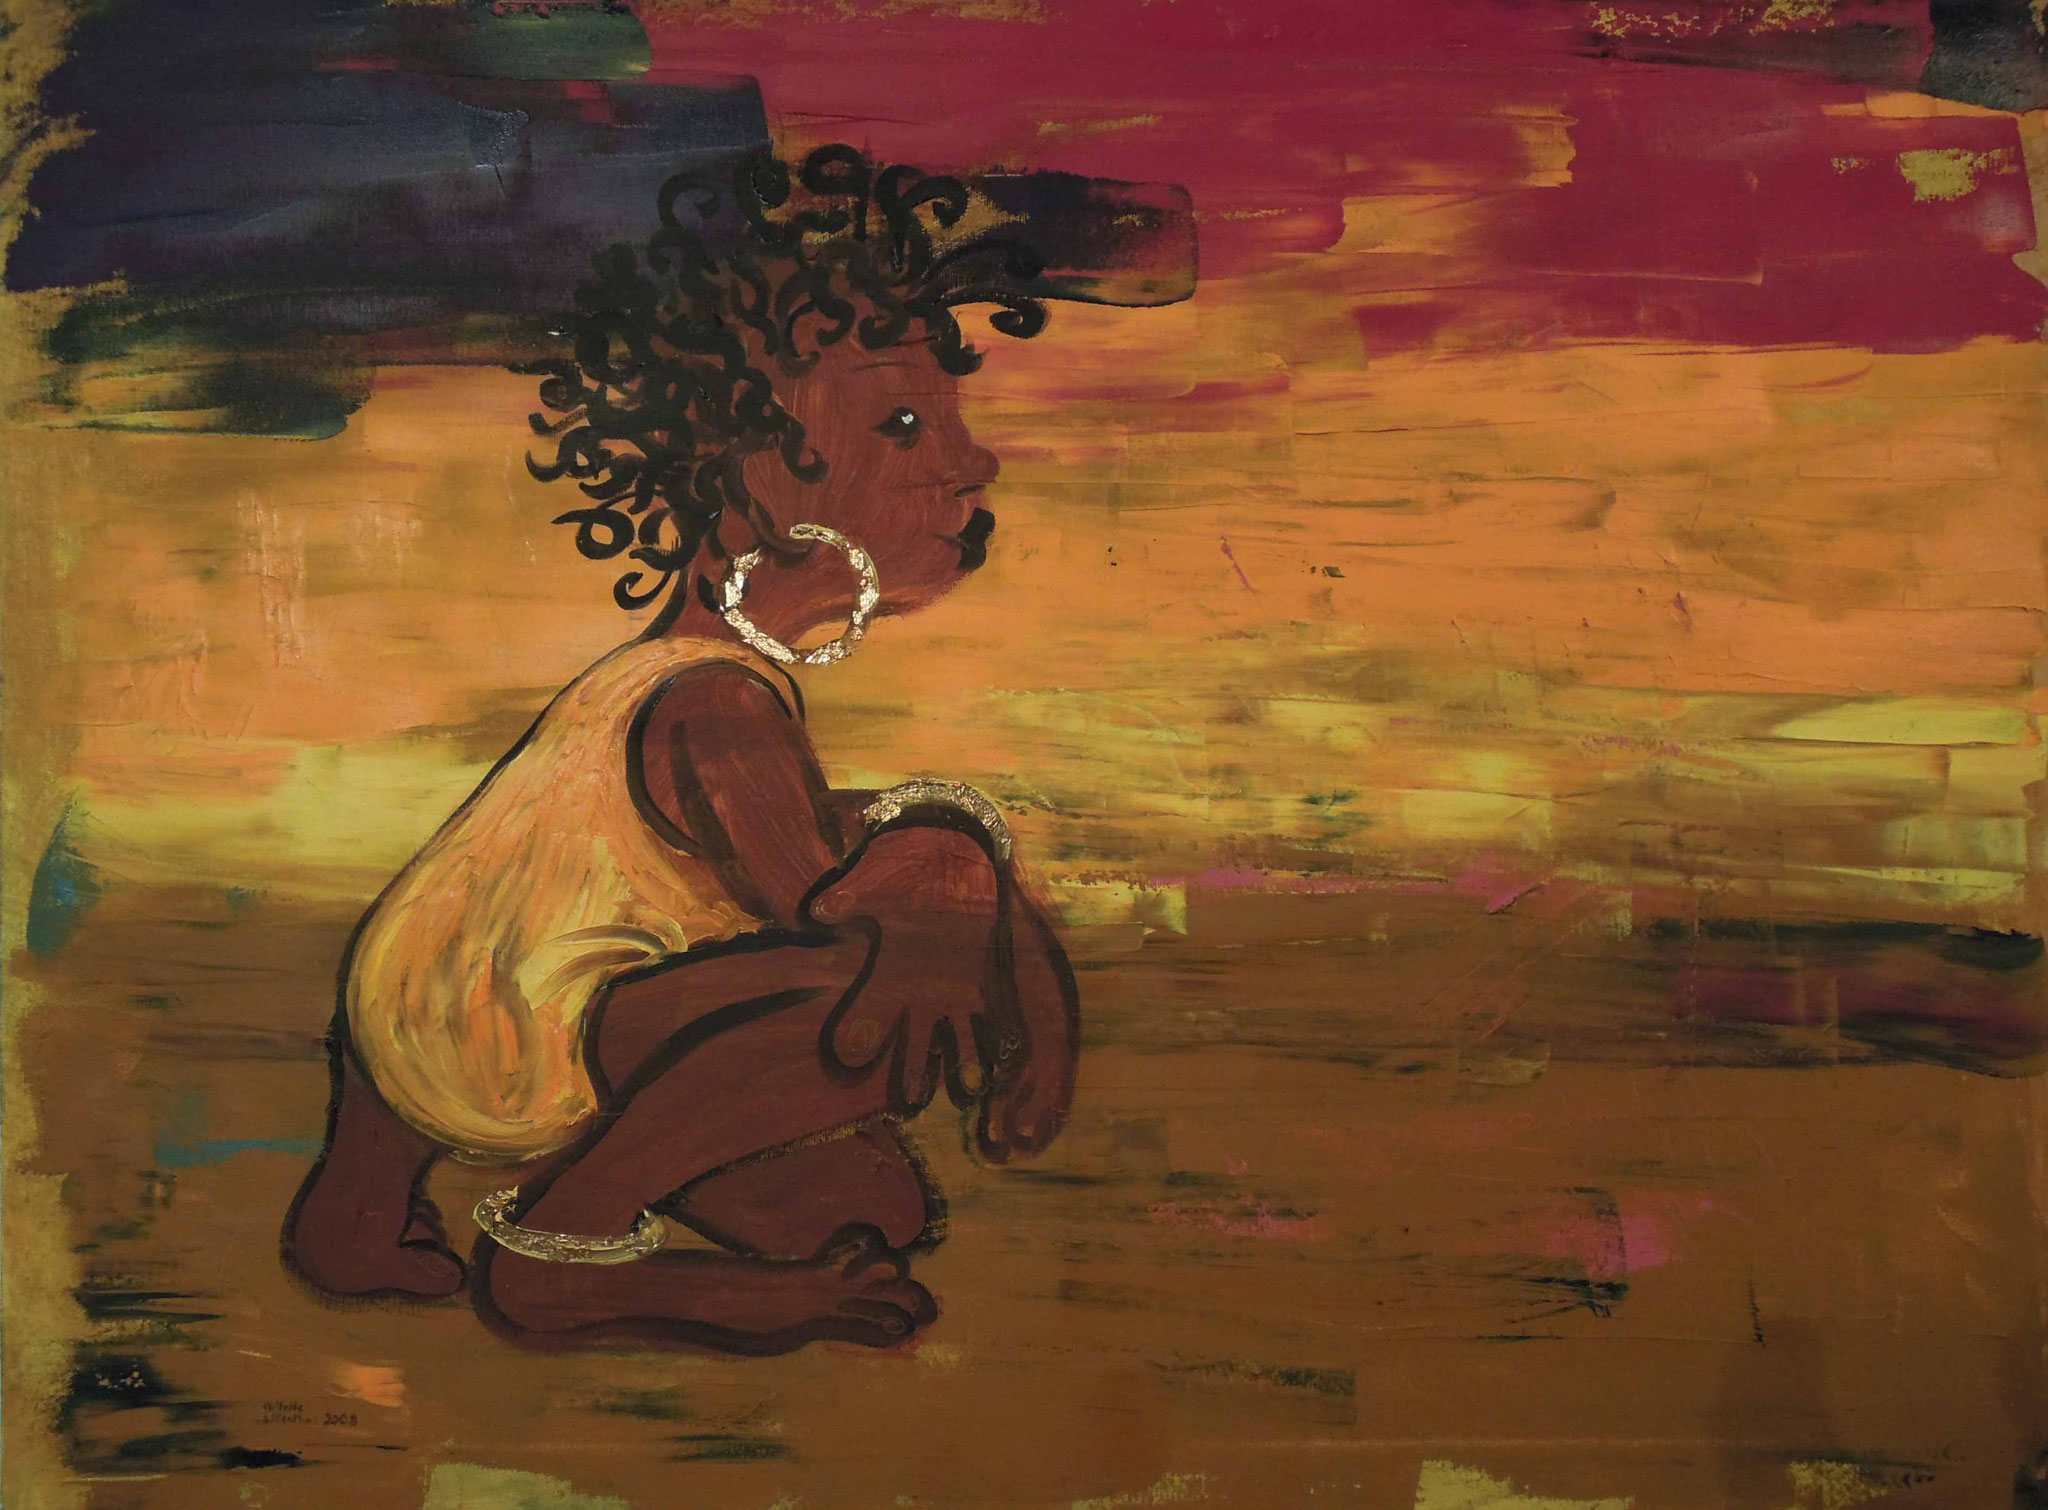 Little African Girl - Öl auf Leinwand 80 x 60 cm